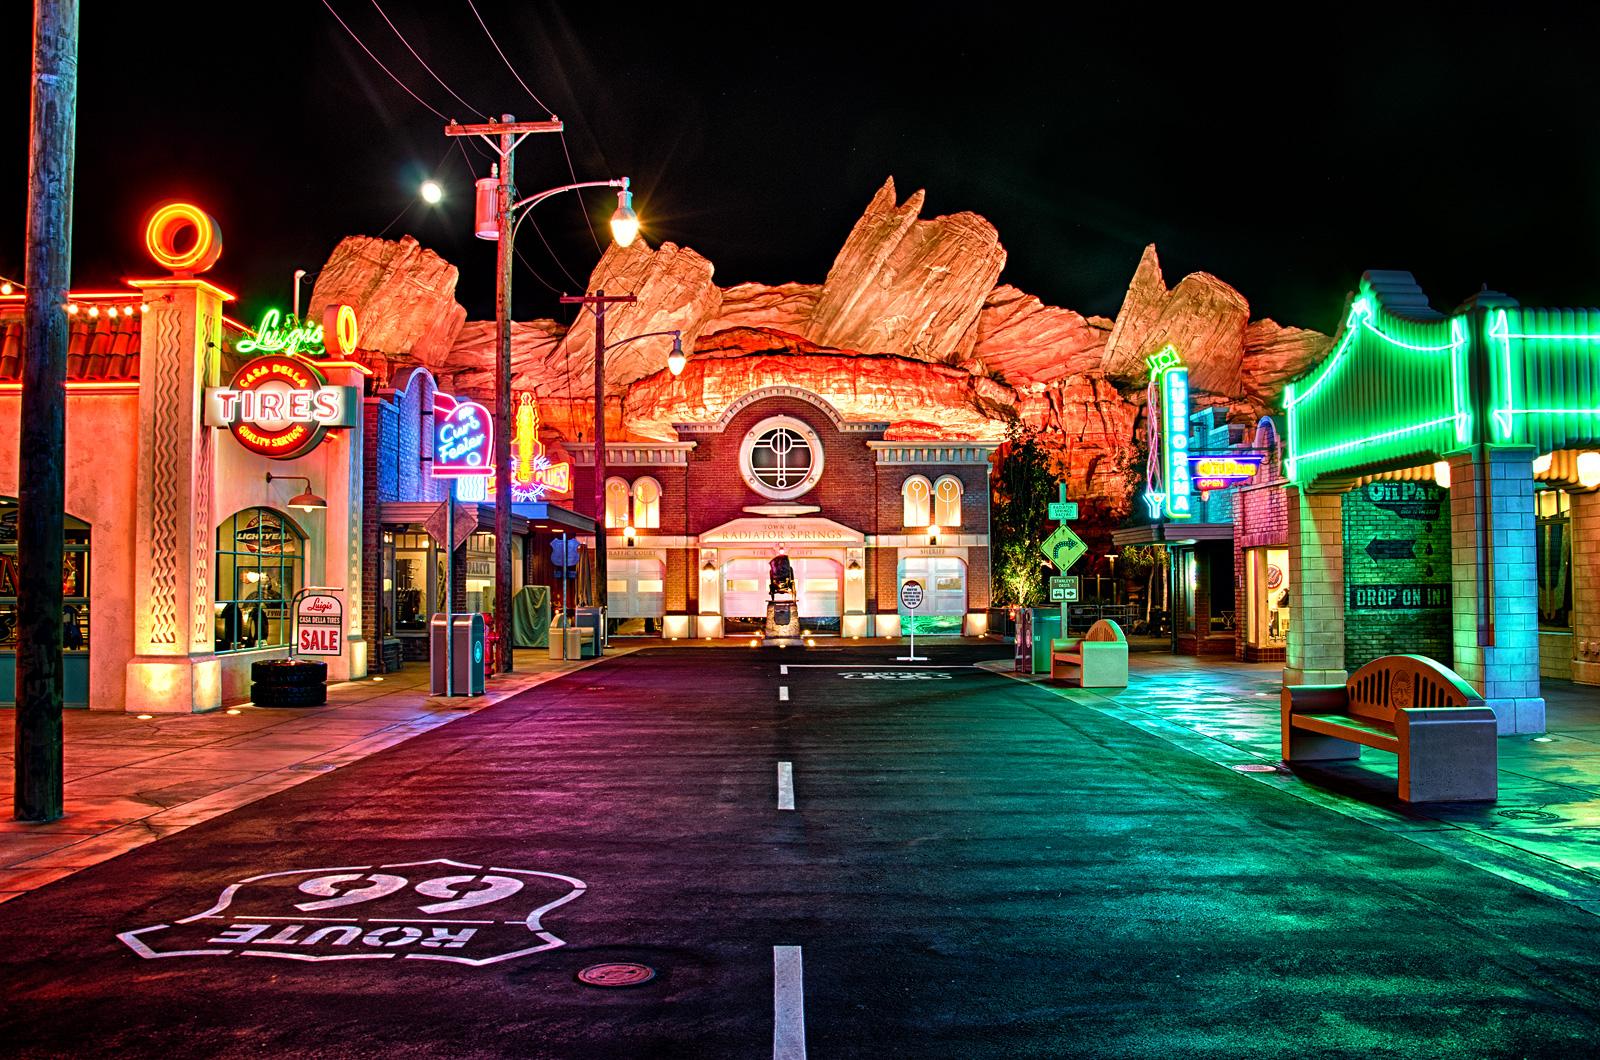 Wallpaper Night Evening Hdr California Christmas Disney Christmas Lights Light Color Christmas Decoration Anaheim Disneycaliforniaadventure Disneylandresort Carsland 1600x1060 724857 Hd Wallpapers Wallhere